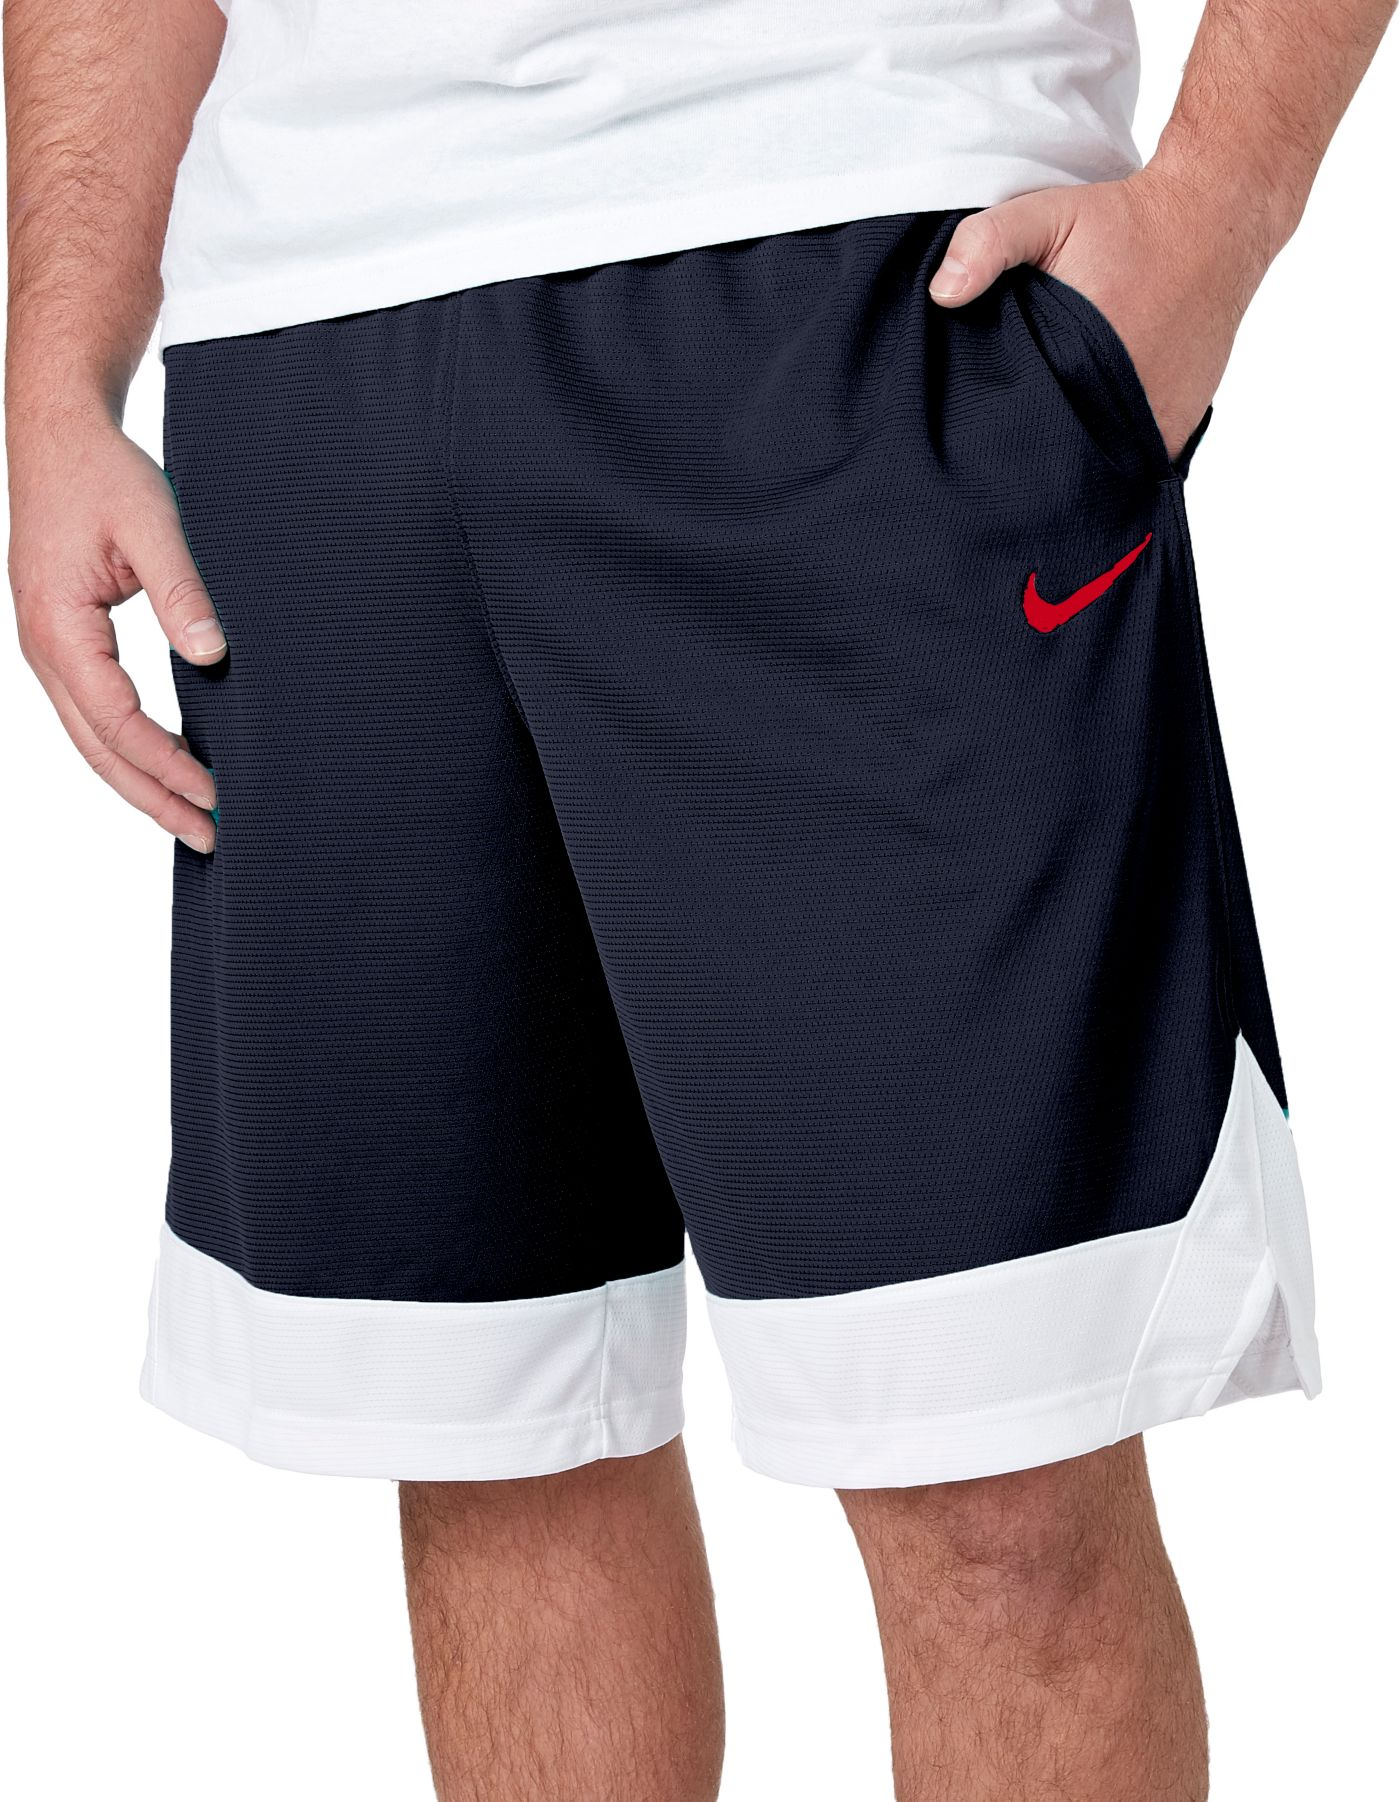 Nike Men's Dry Icon Basketball Shorts (Regular and Big & Tall)